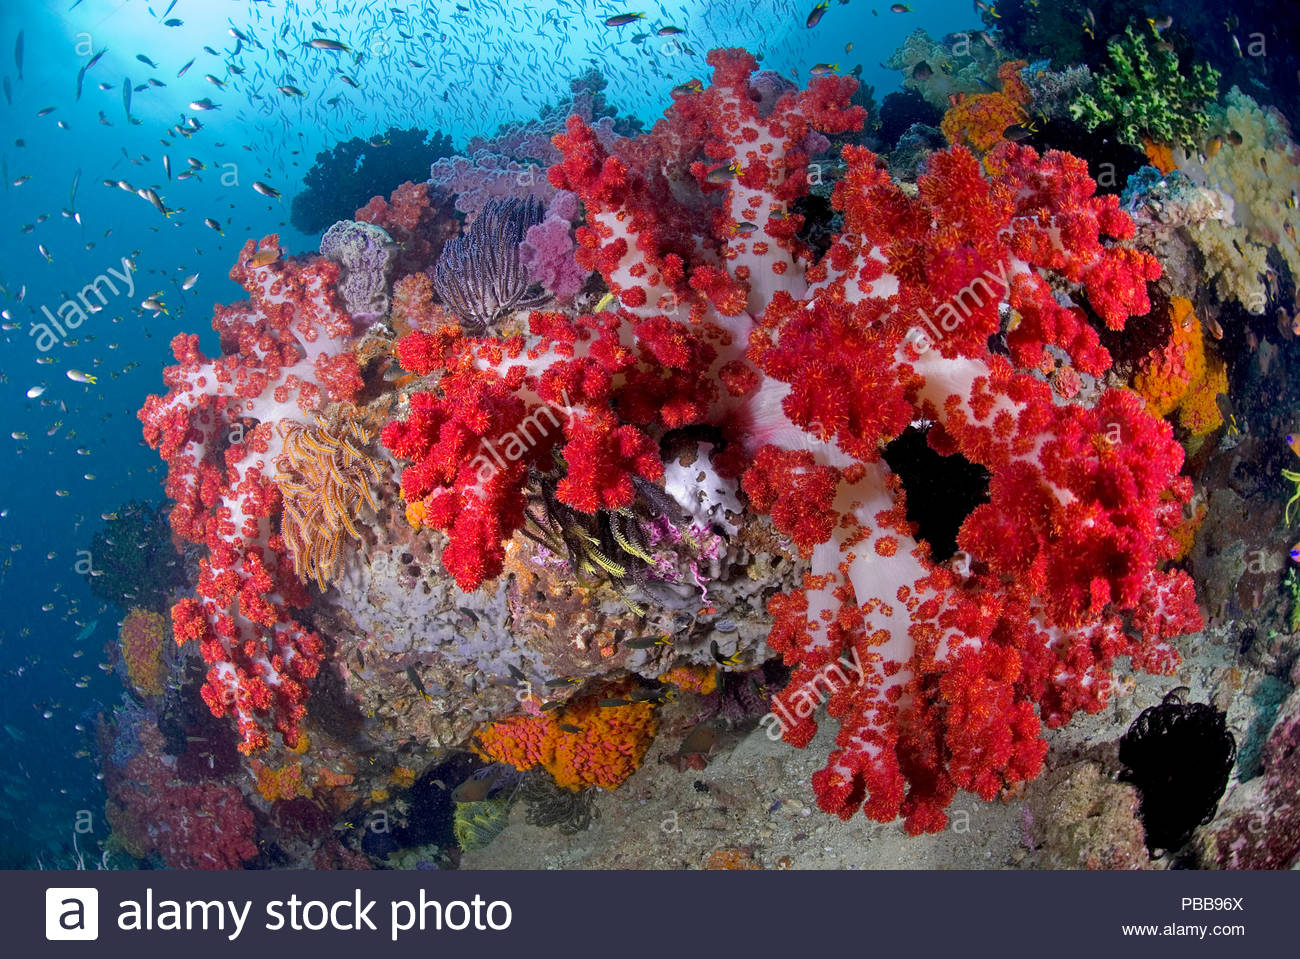 Buntes Korallenriff, Kri island, Raja Ampat, Irian Jaya, Indonesien   Colourful coral reef, Kri island, Raja Ampat, Irian Jaya, Indonesia - Stock Image